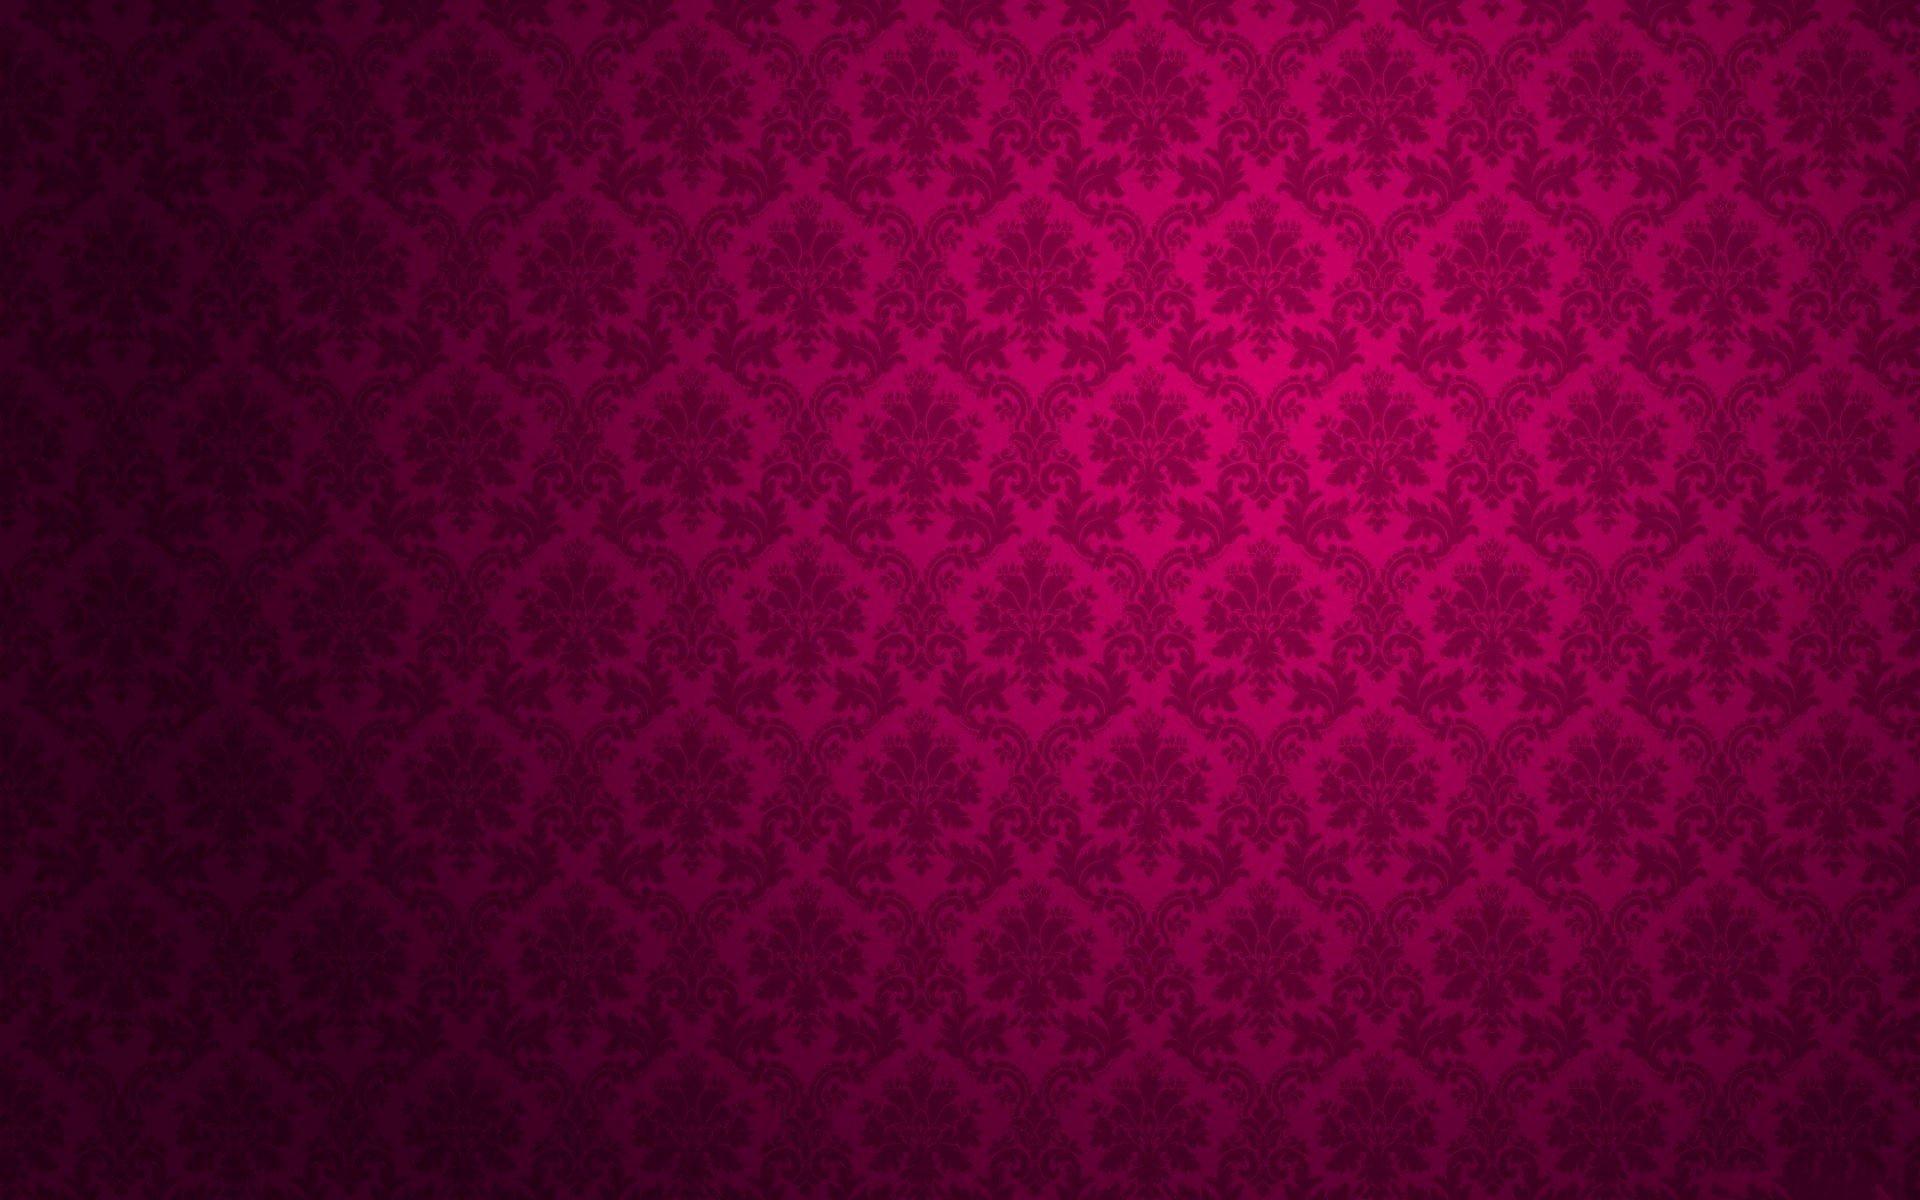 wallpaper.wiki-Damask-Background-HD-PIC-WPD009383